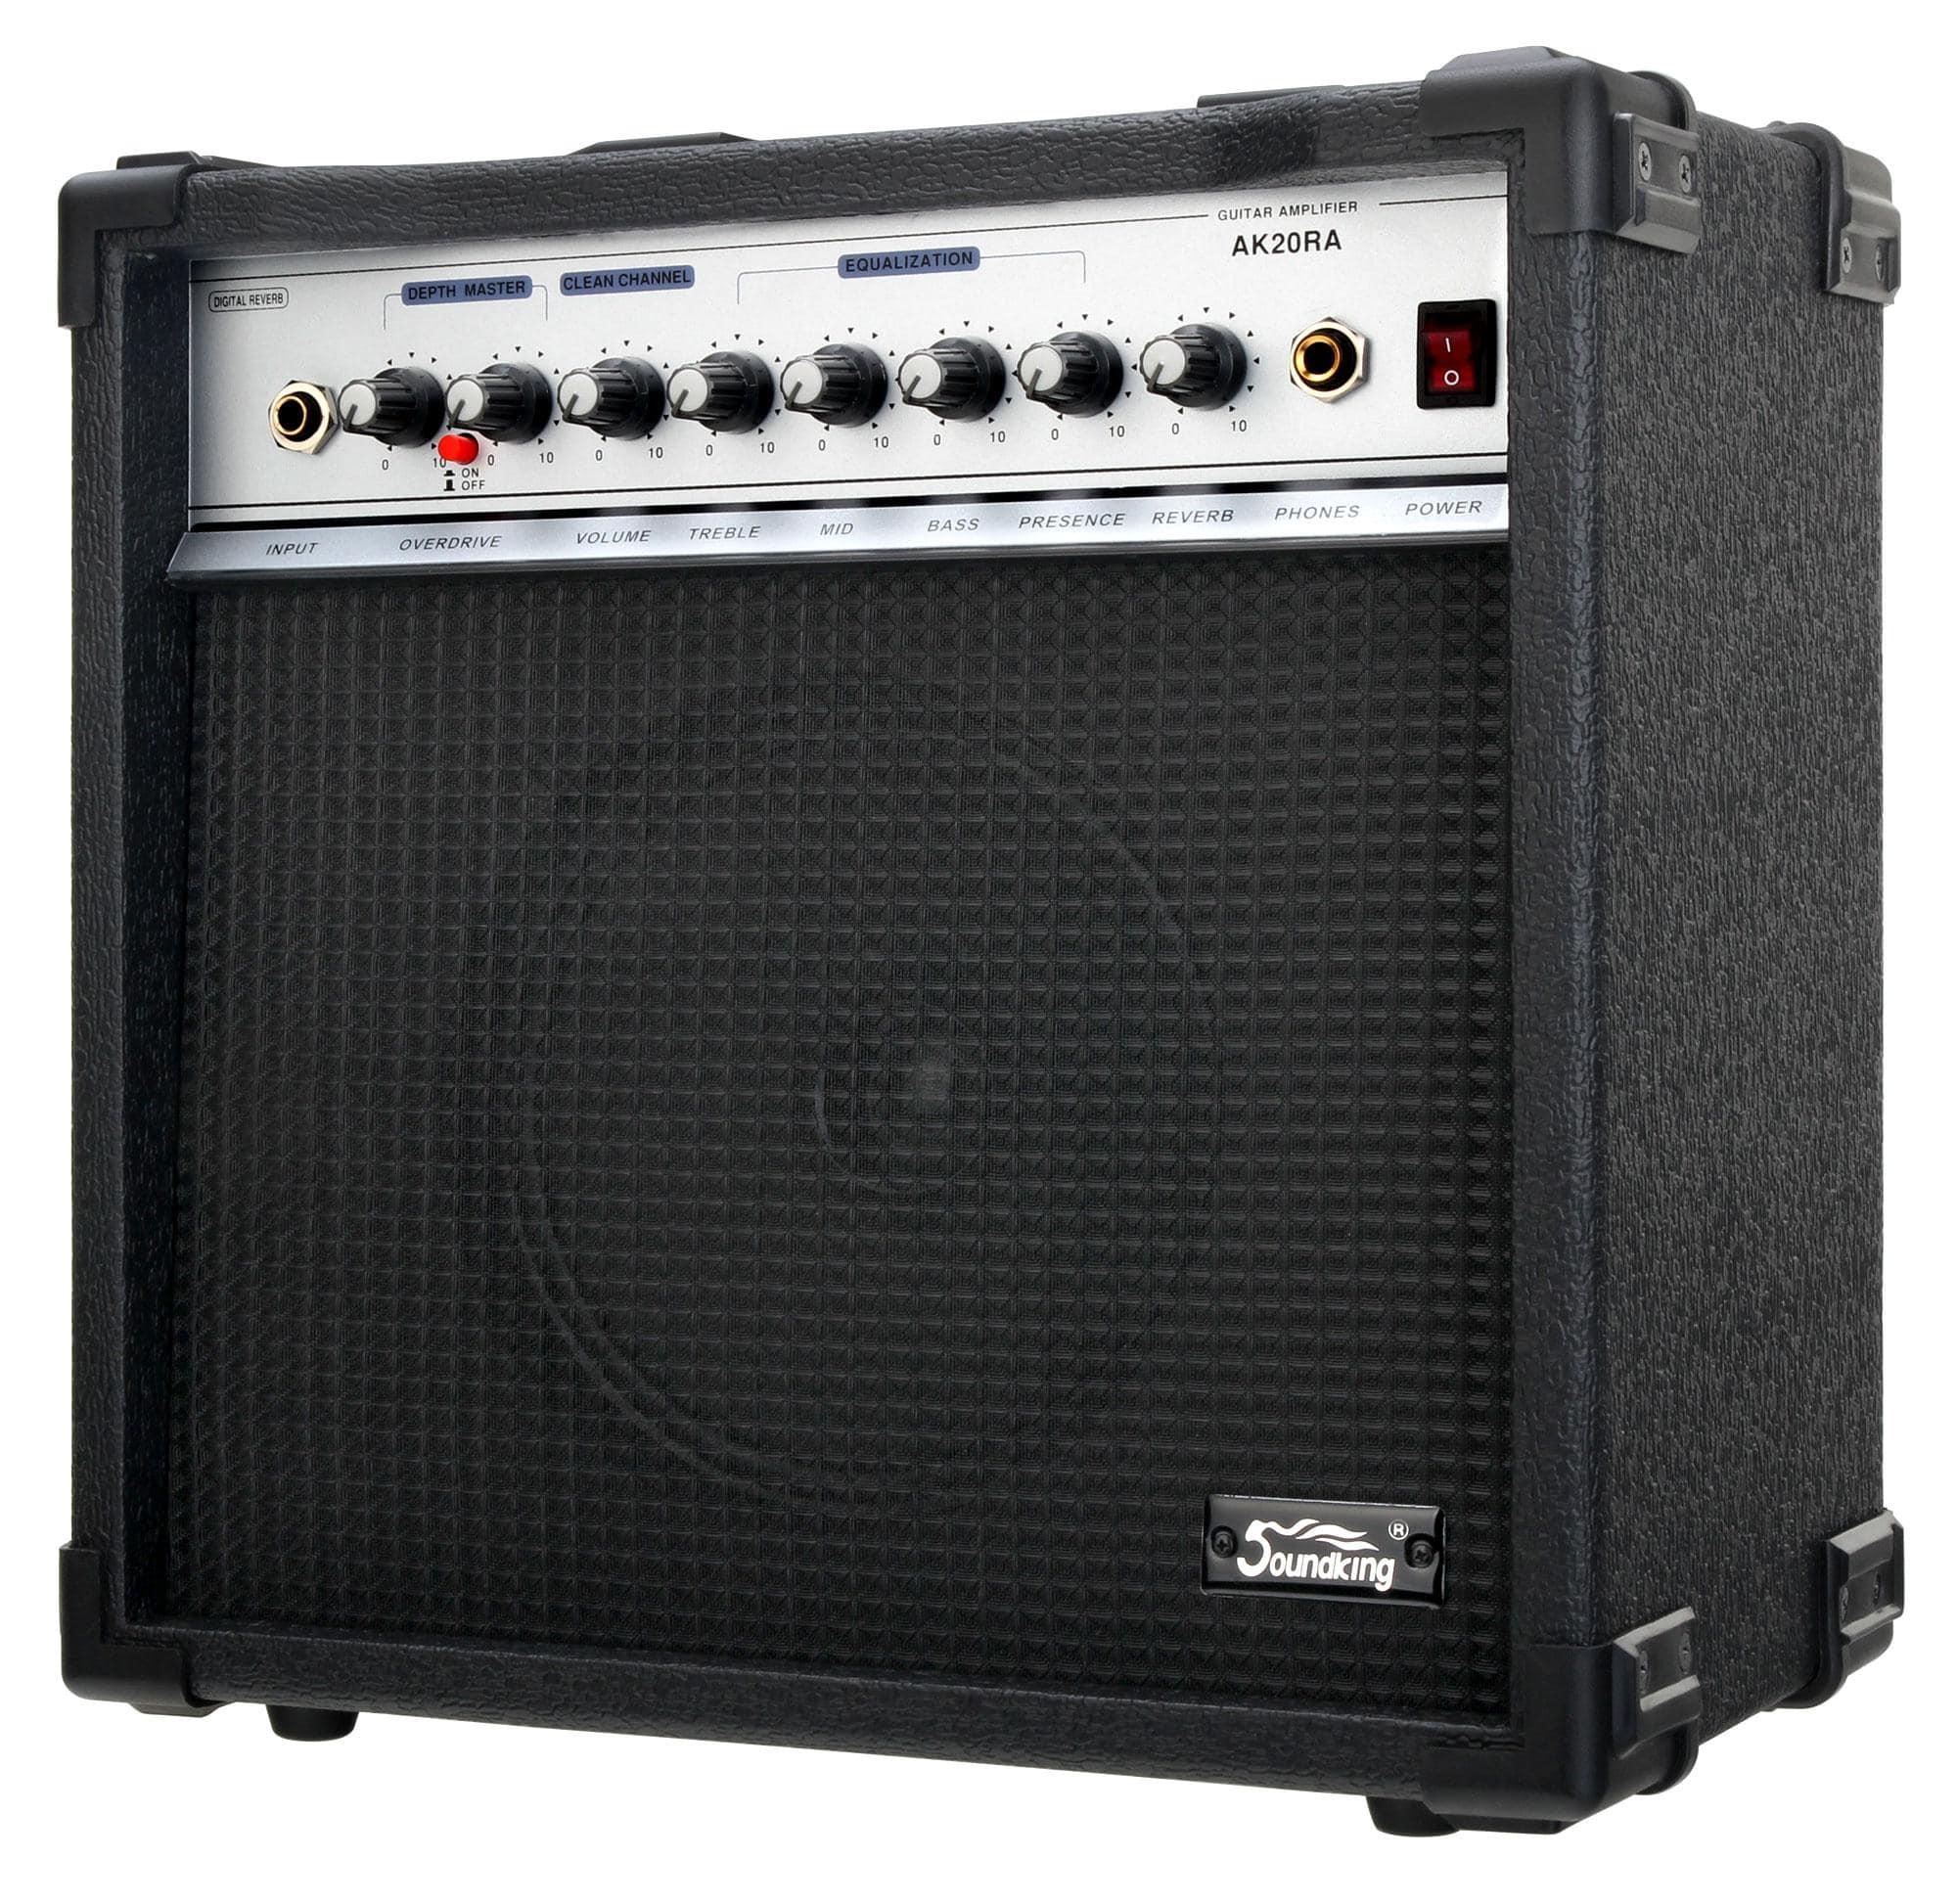 Soundking AK20 RA Gitarrencombo 2 Kanal, 60 Watt